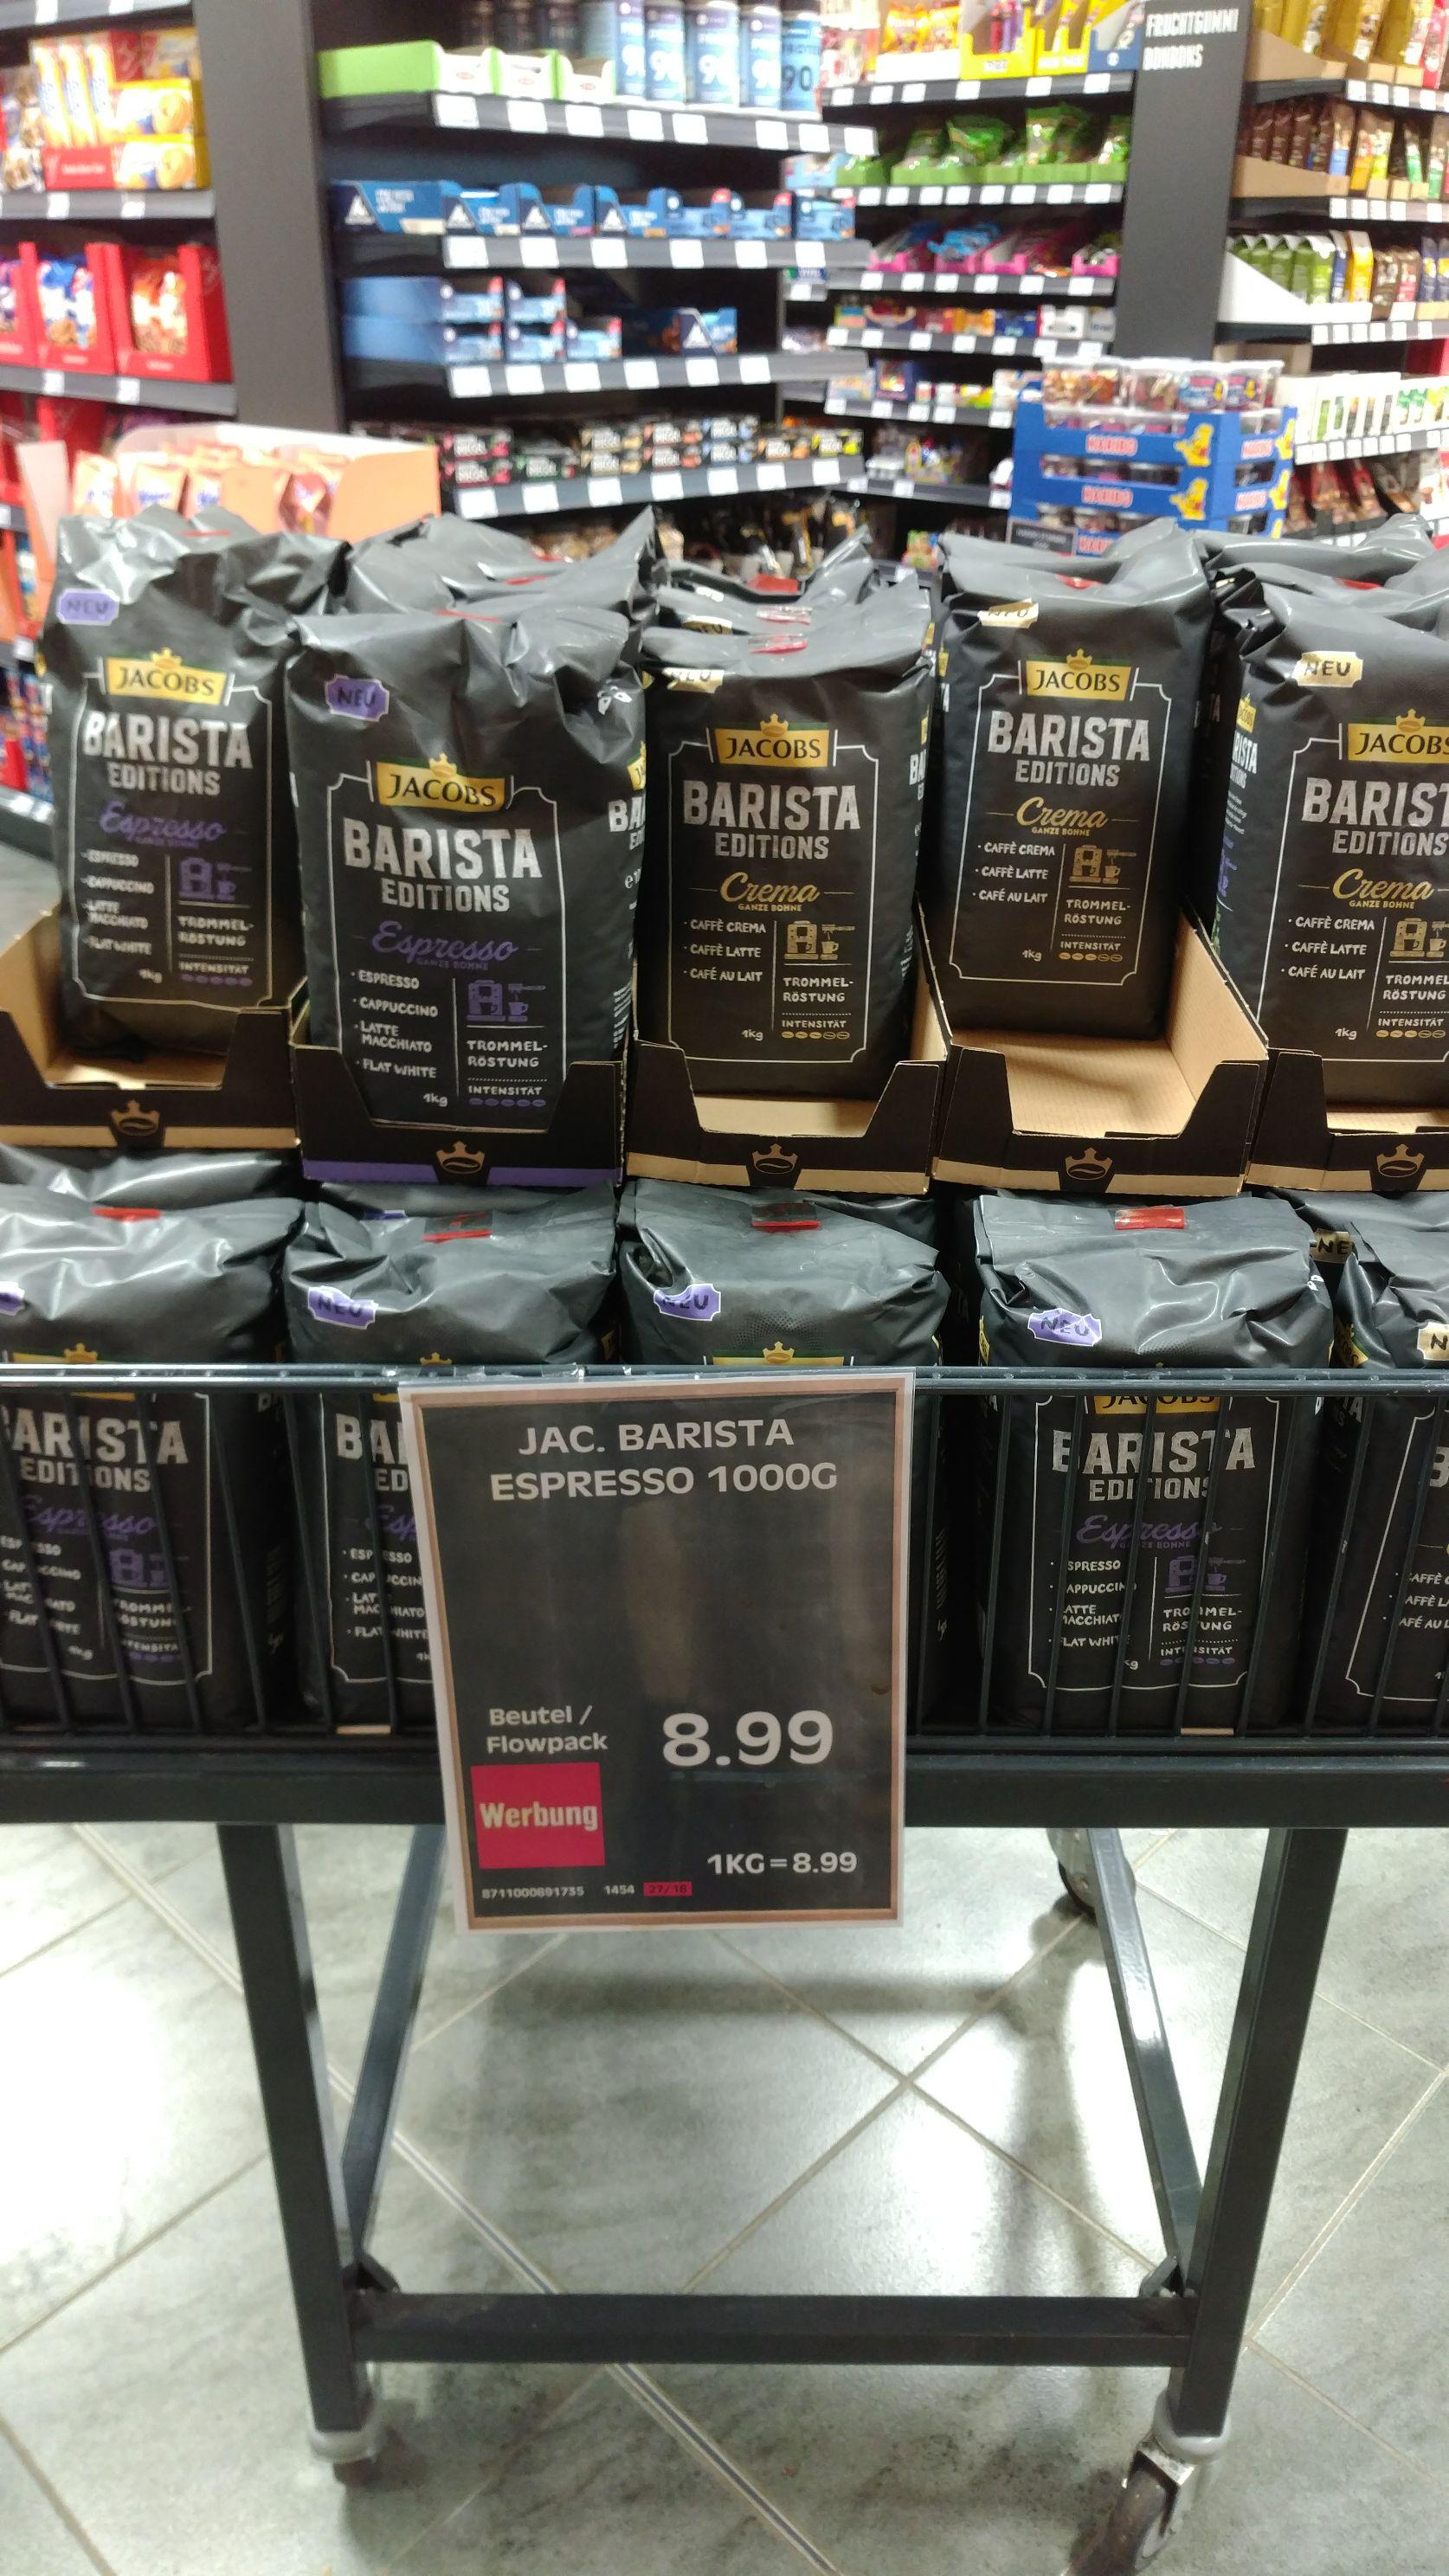 Jacobs Barista Editions Crema & Espresso *Lokal*